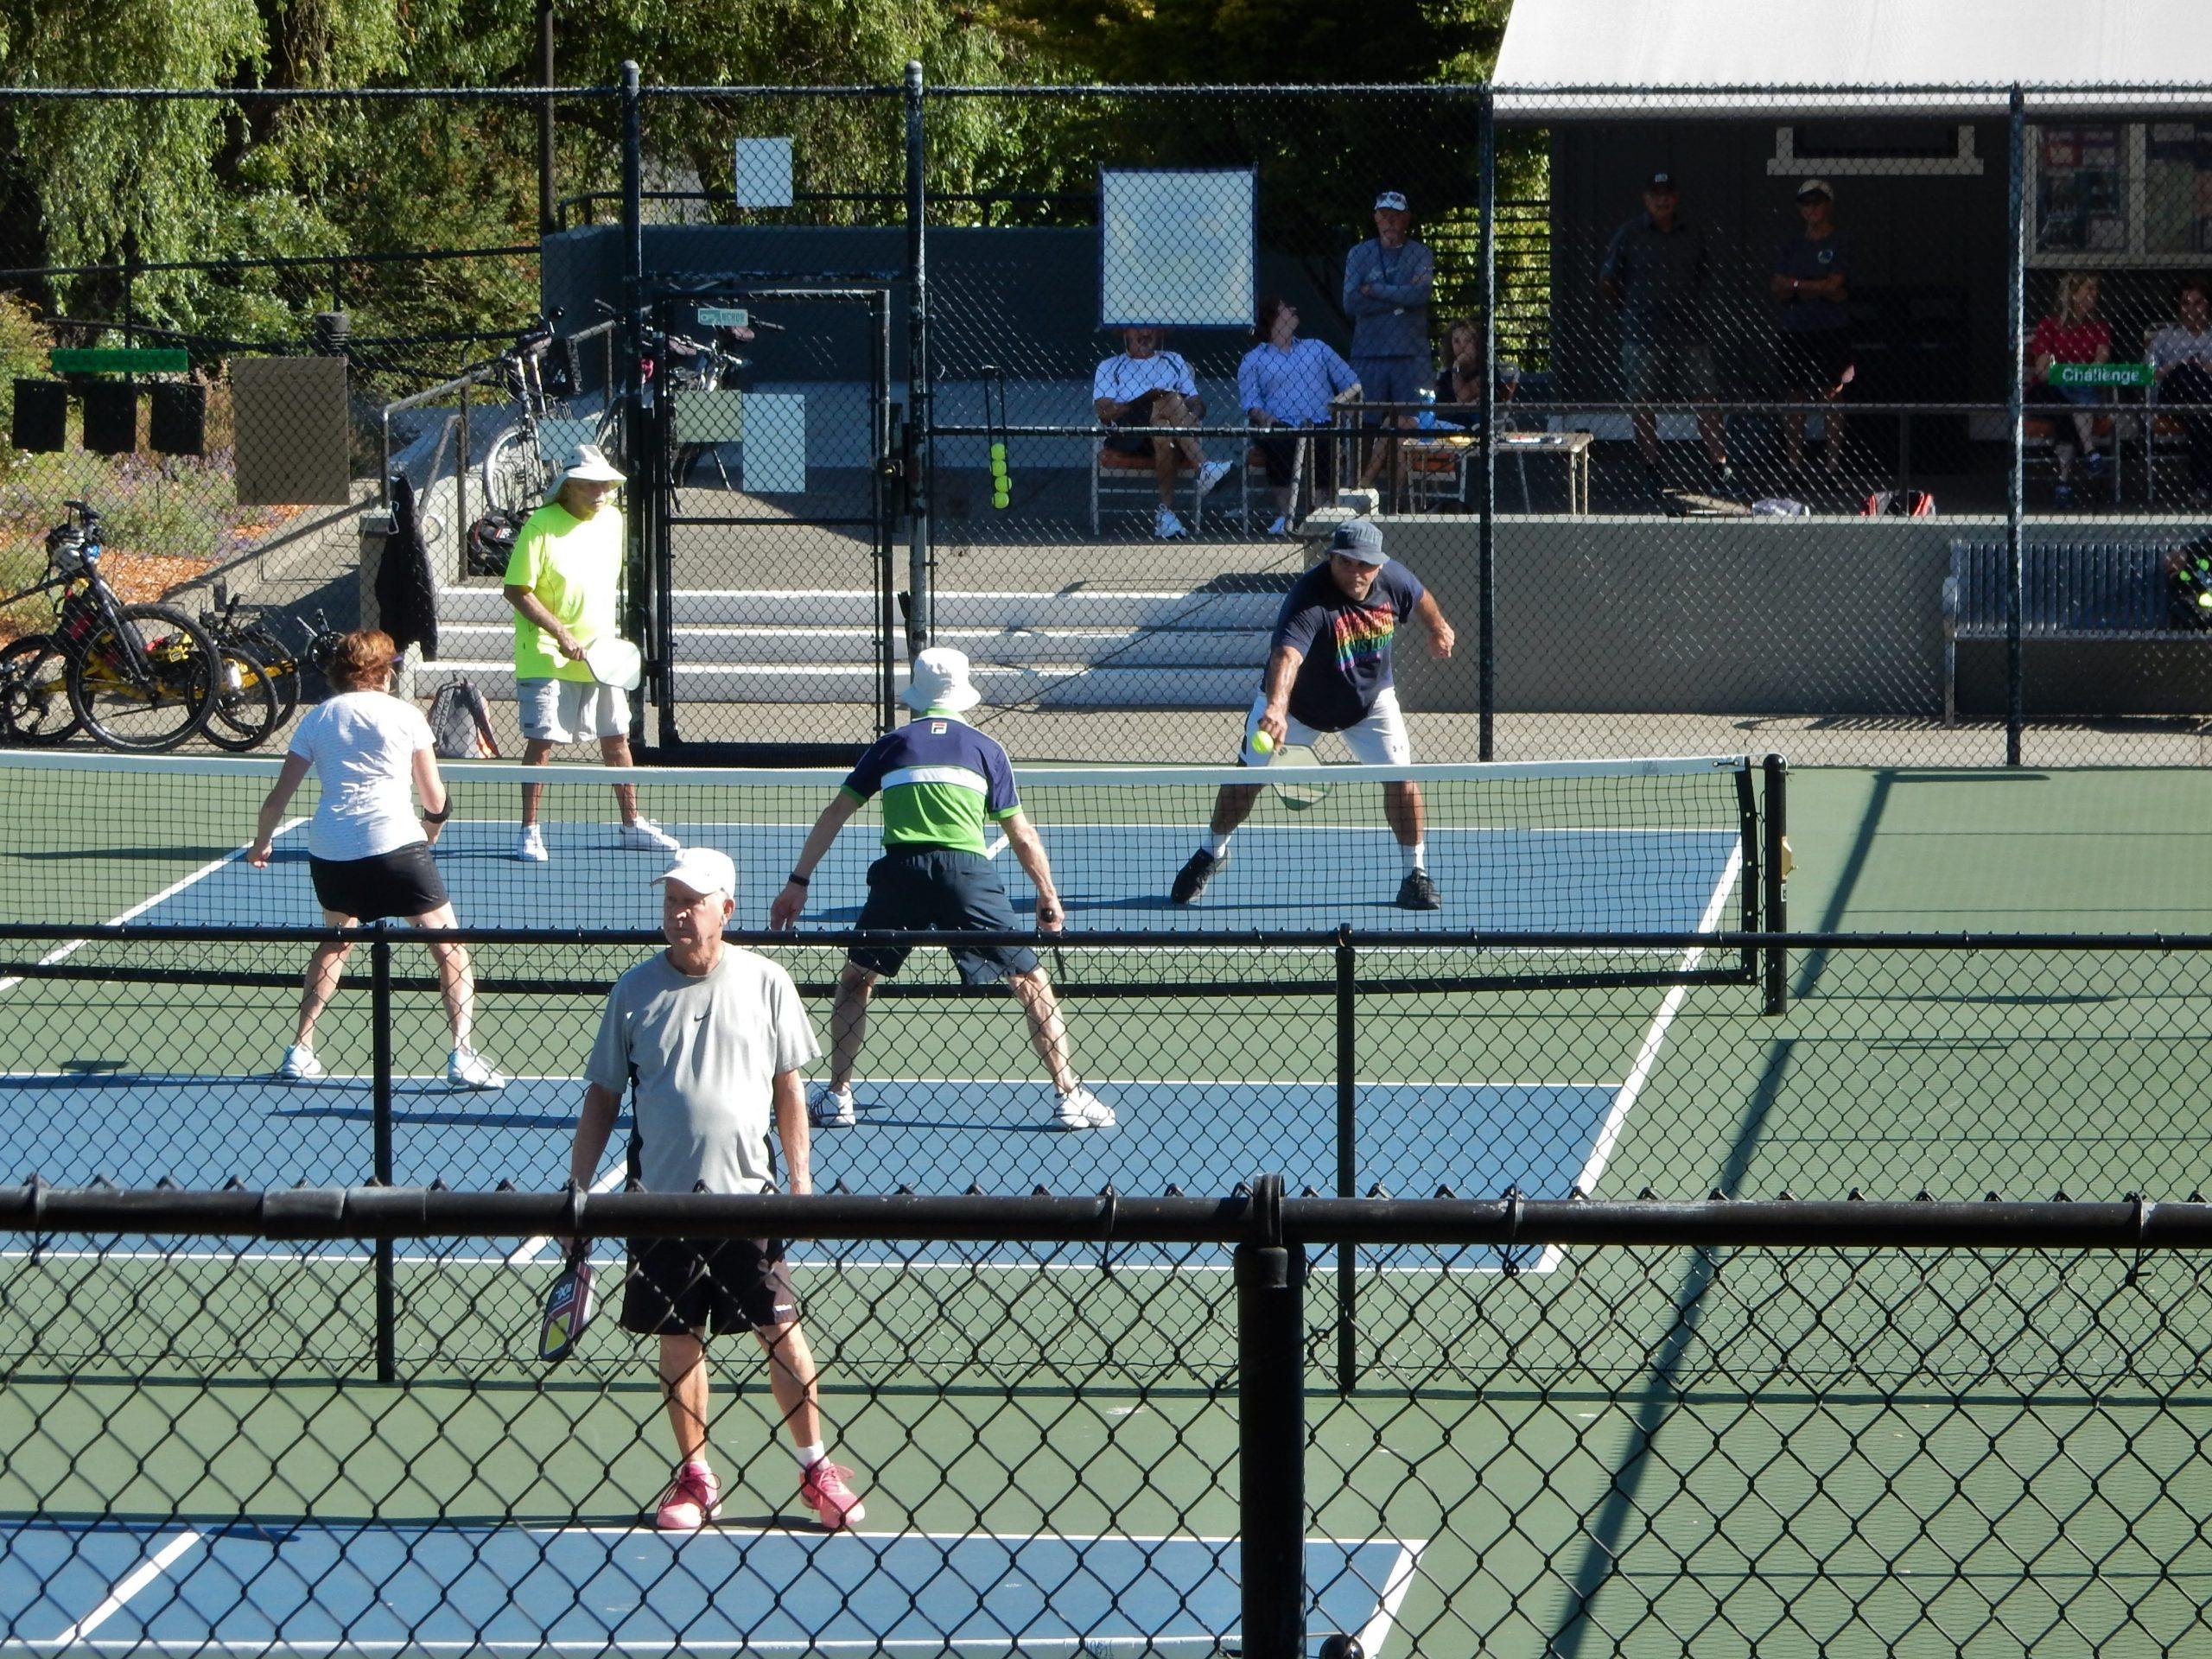 2019-8-31 Labor Day Weekend Tennis Tournament (20)